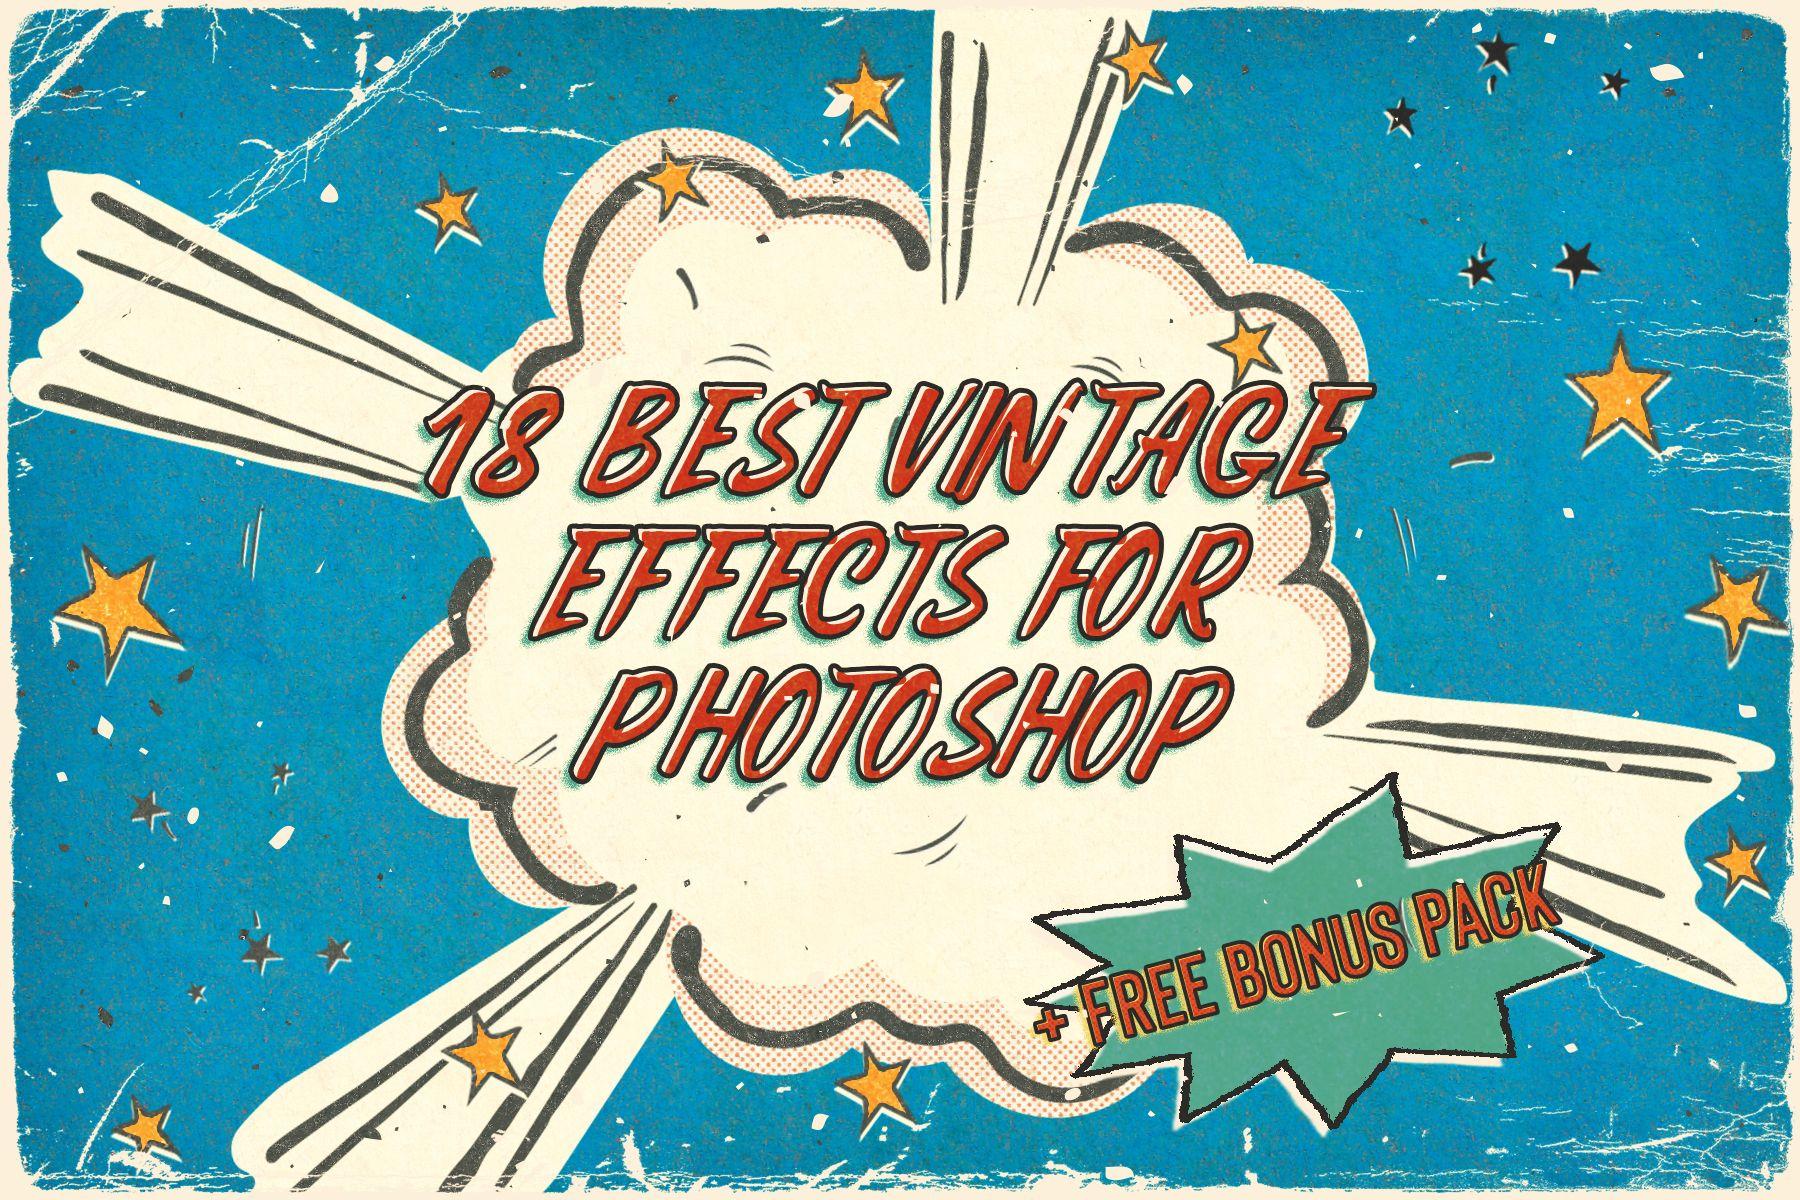 18 Vintage Effects For Photoshop Free Bonus Pack In 2020 Vintage Text Photoshop Retro Film